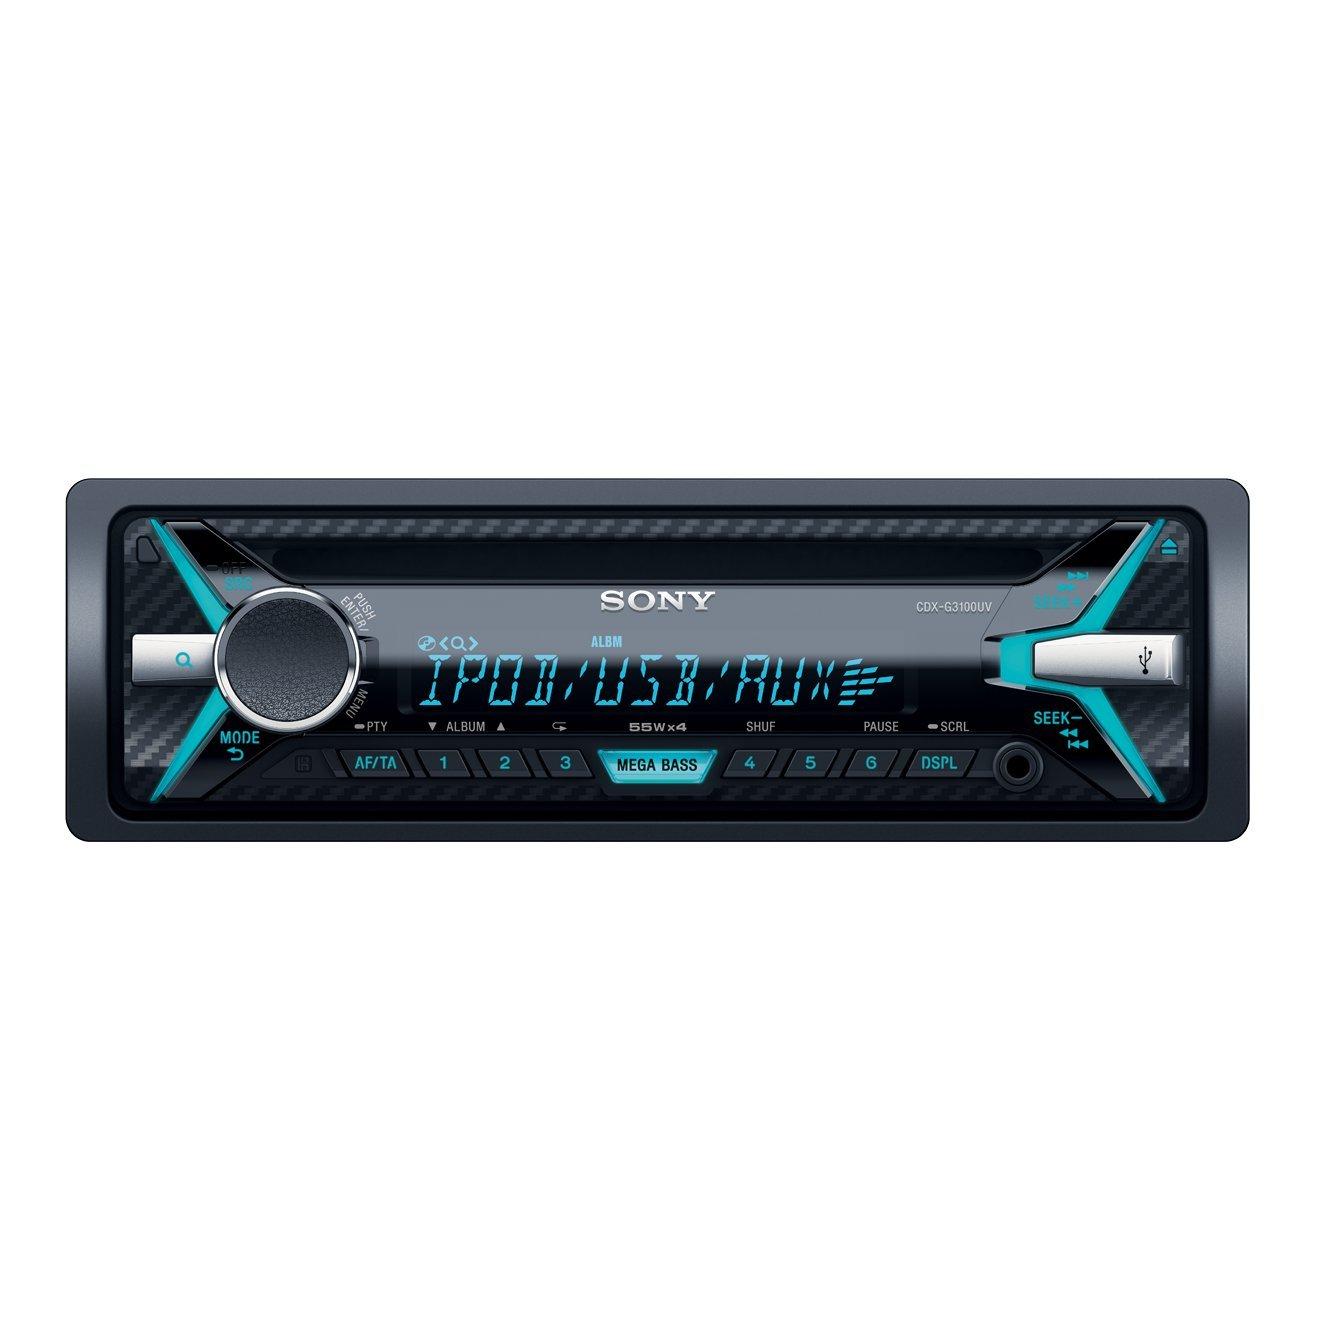 Sony CDX-G3100UV Autoradio (CD-Player, USB/AUX-Eingang, Apple iPod/iPhone Control, 4X 55 Watt) schwarz CDXG3100UV.EUR